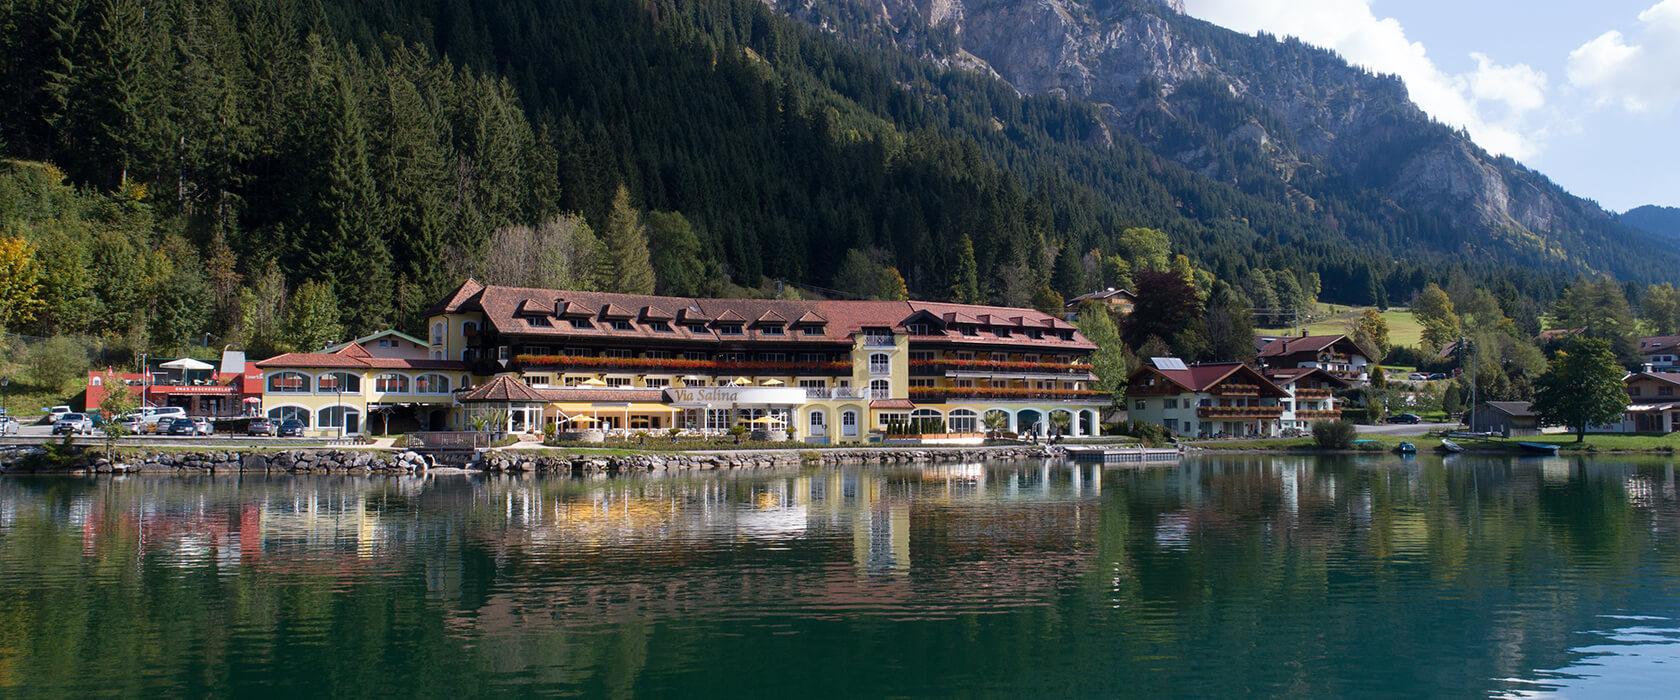 Hotel Via Salina am Haldensee im Tannheimer Tal